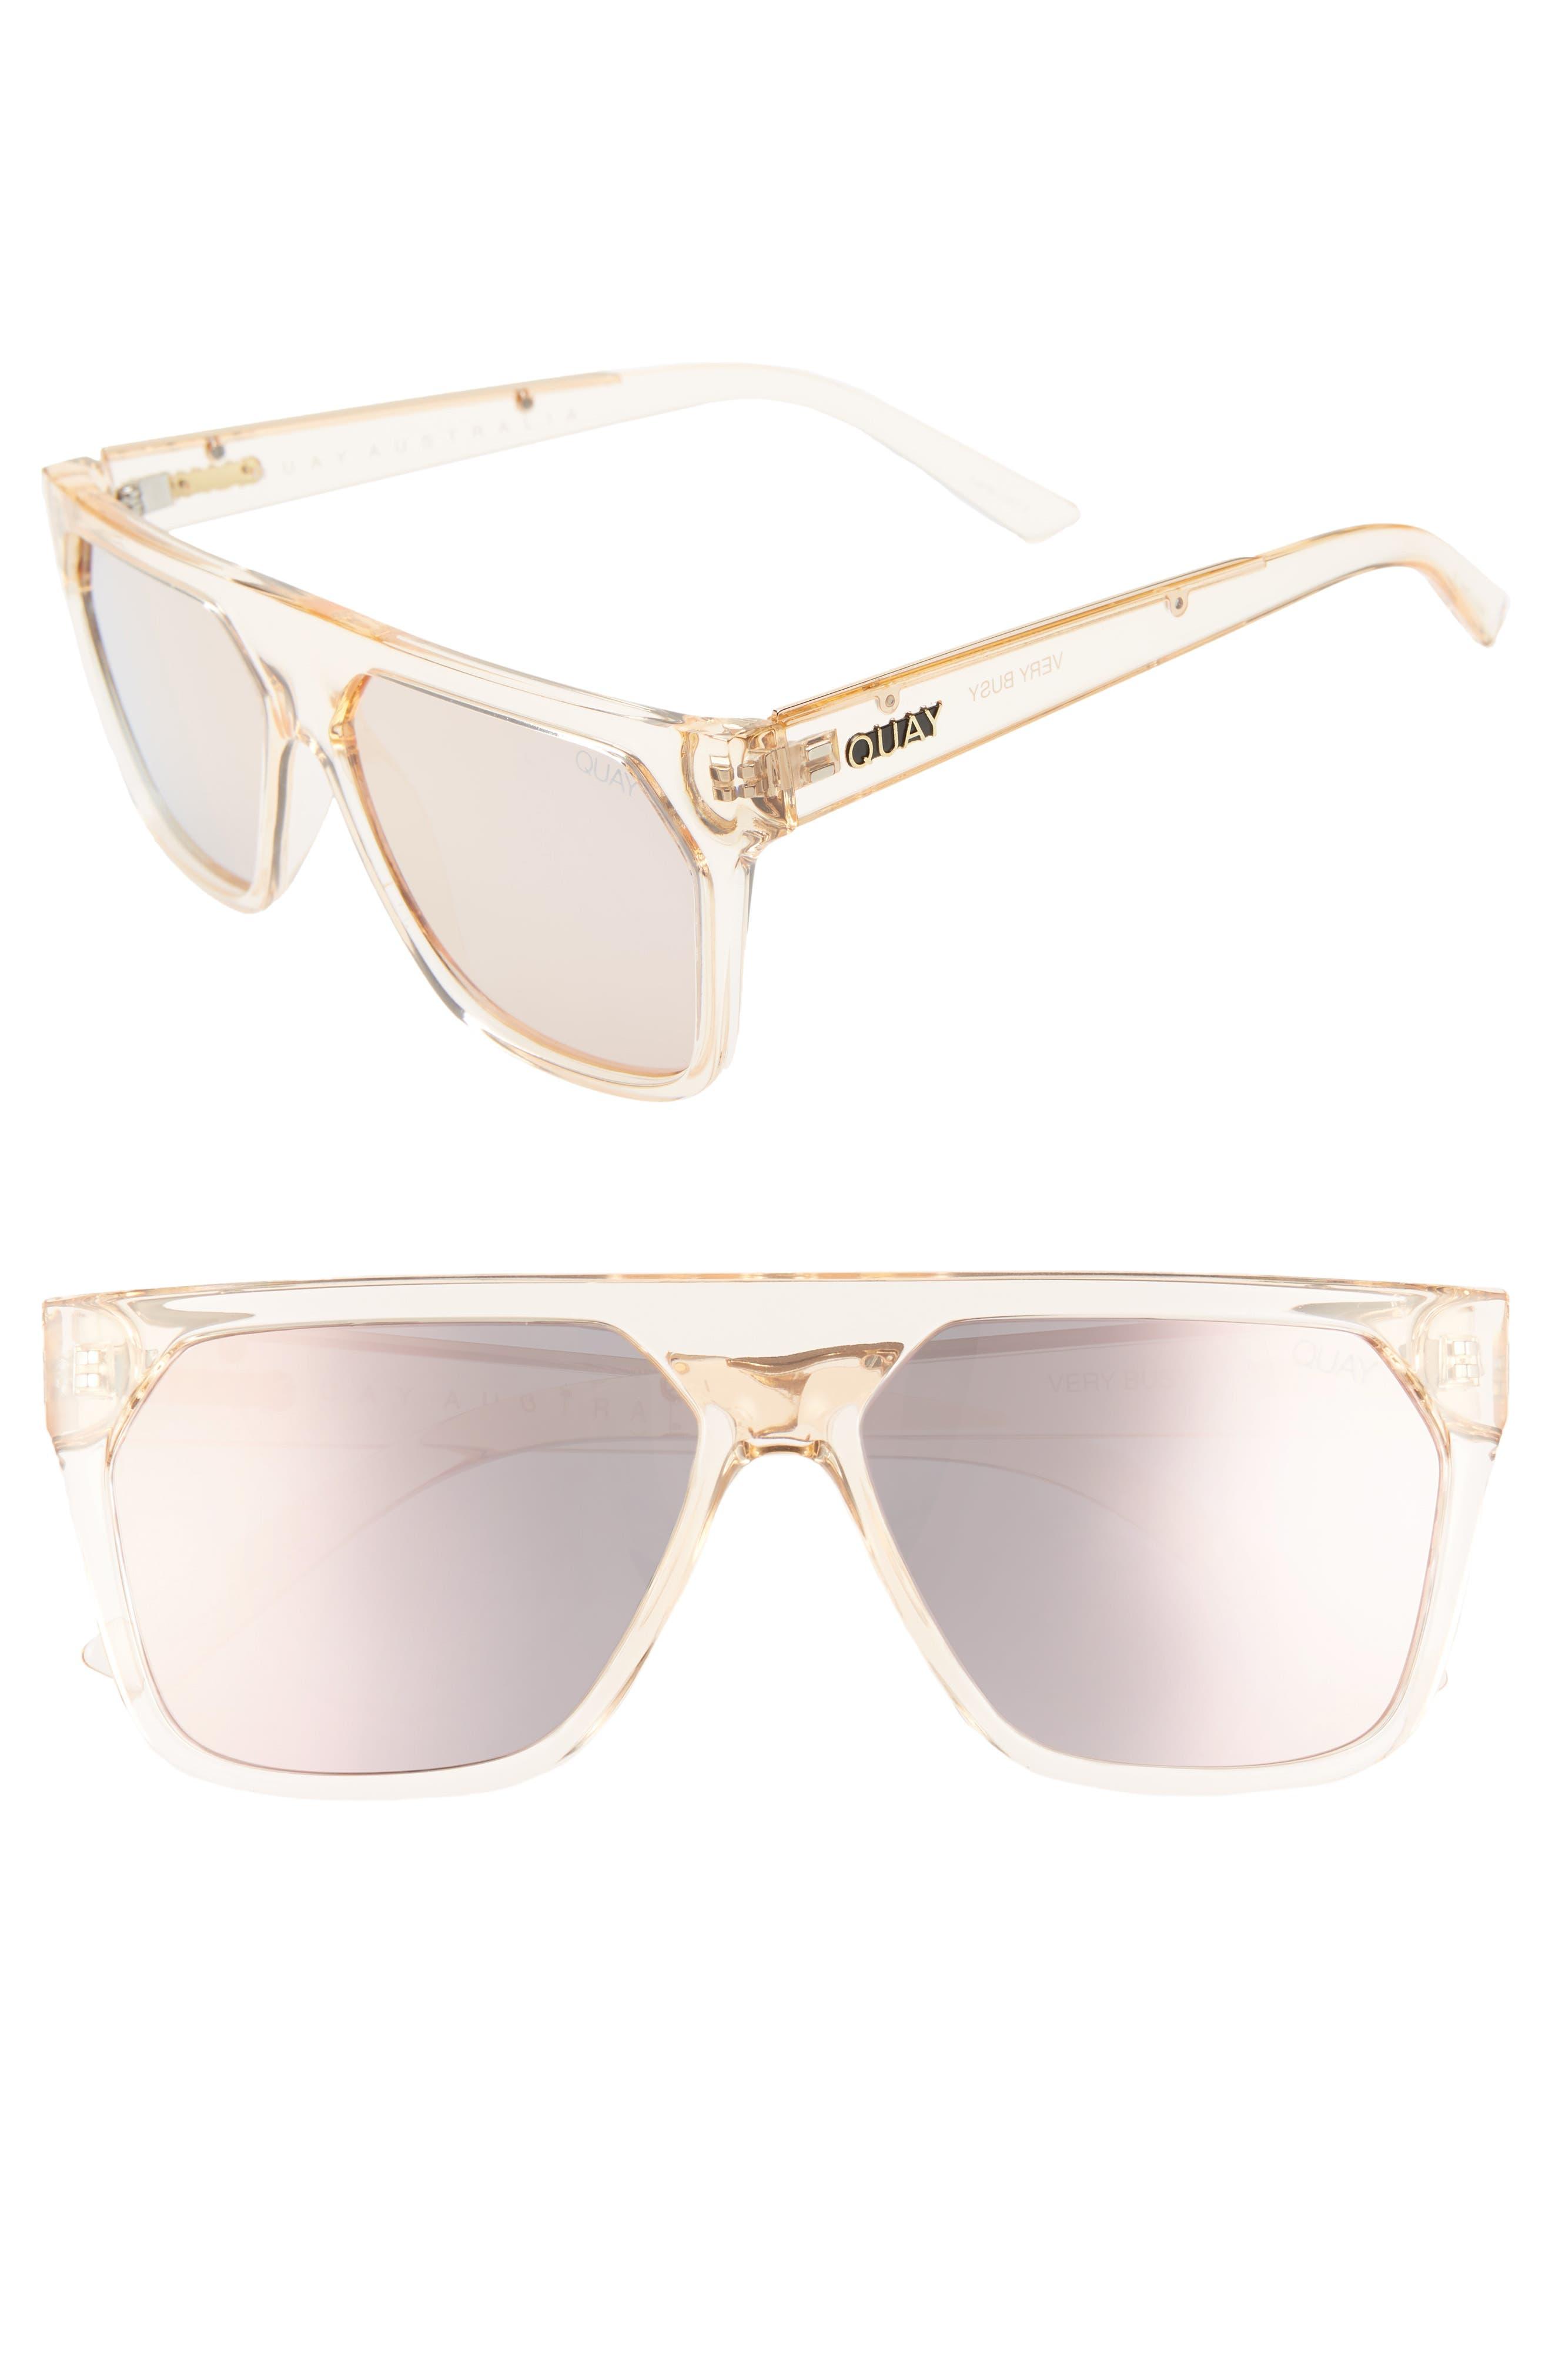 Quay Australia X Jaclyn Hill Very Busy 5m Shield Sunglasses - Champagne / Rose